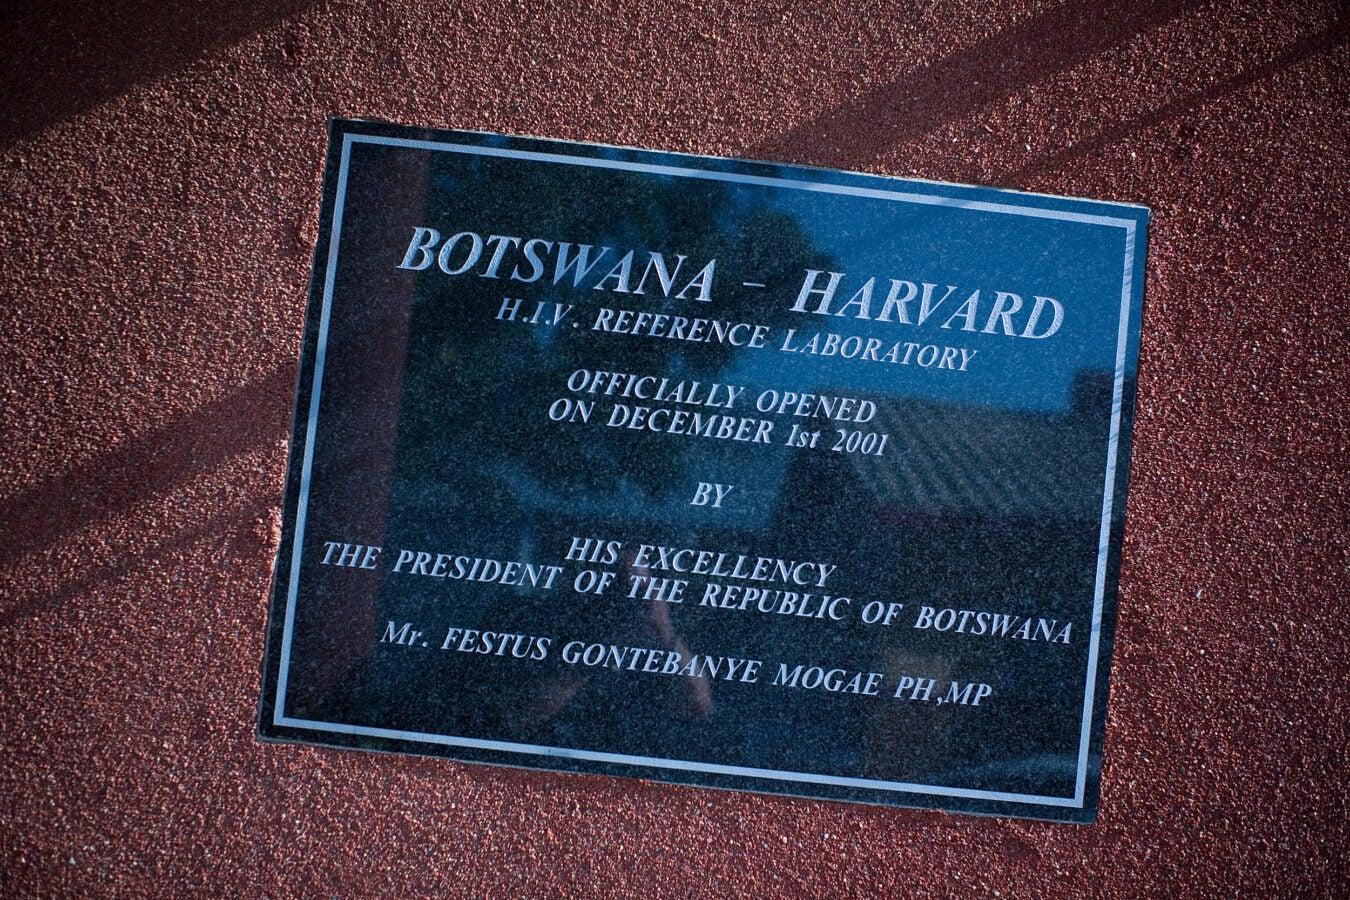 Plaque dedicating Botswana-Harvard HIV Reference Laboratory.